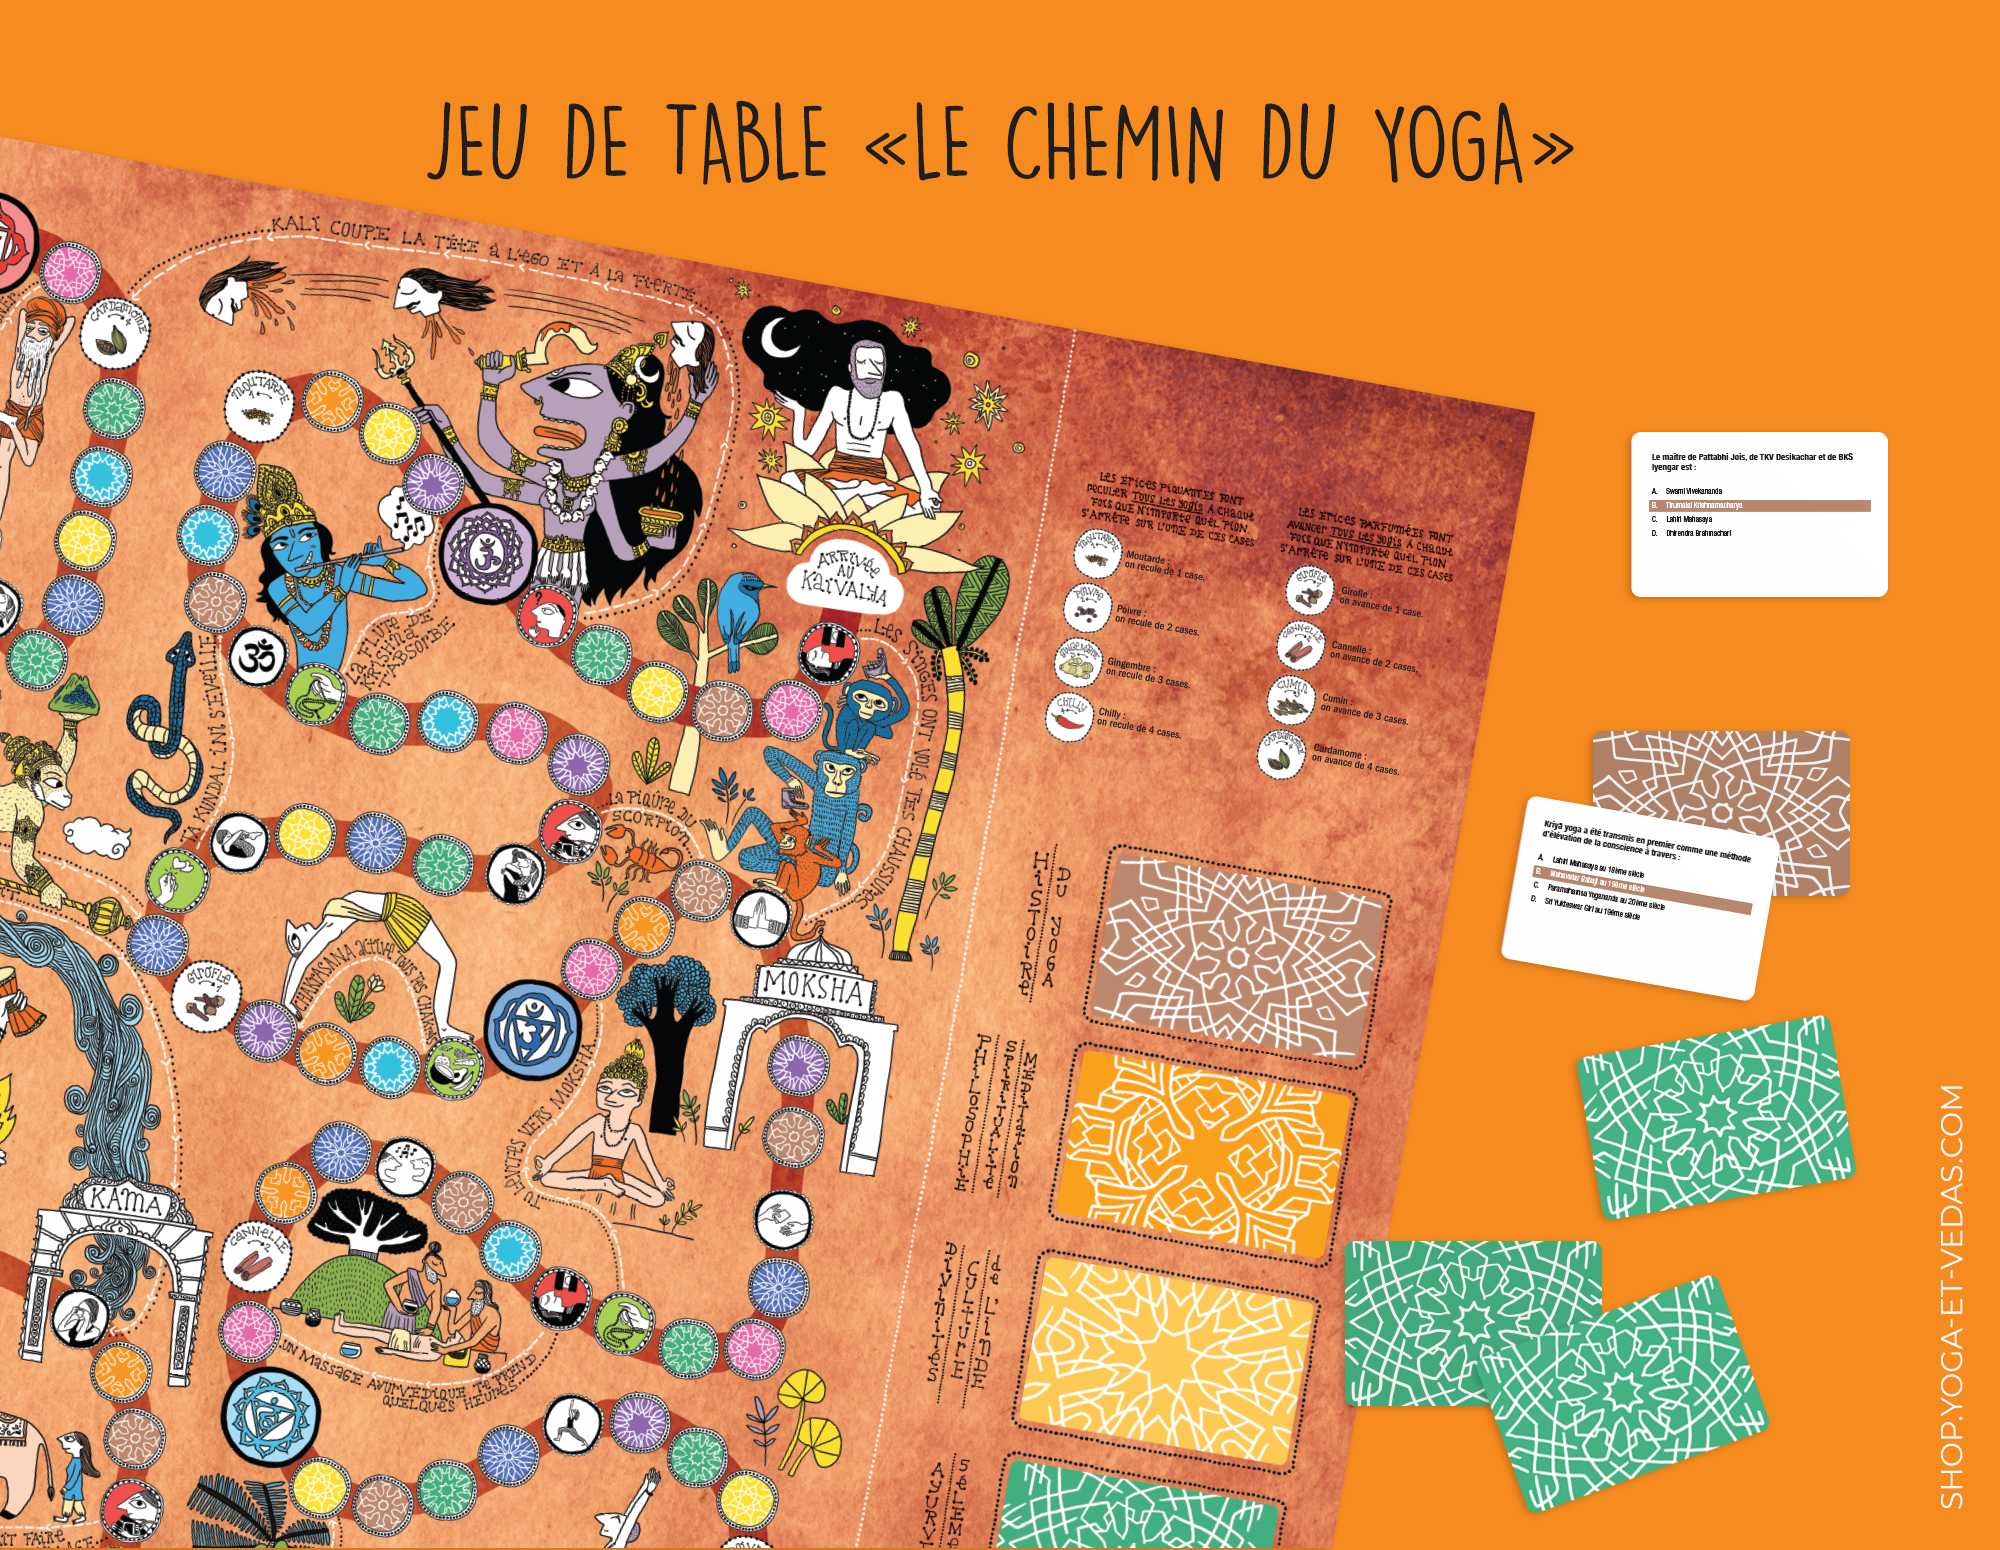 Jeu Chemin du Yoga - Shop Yoga&Vedas